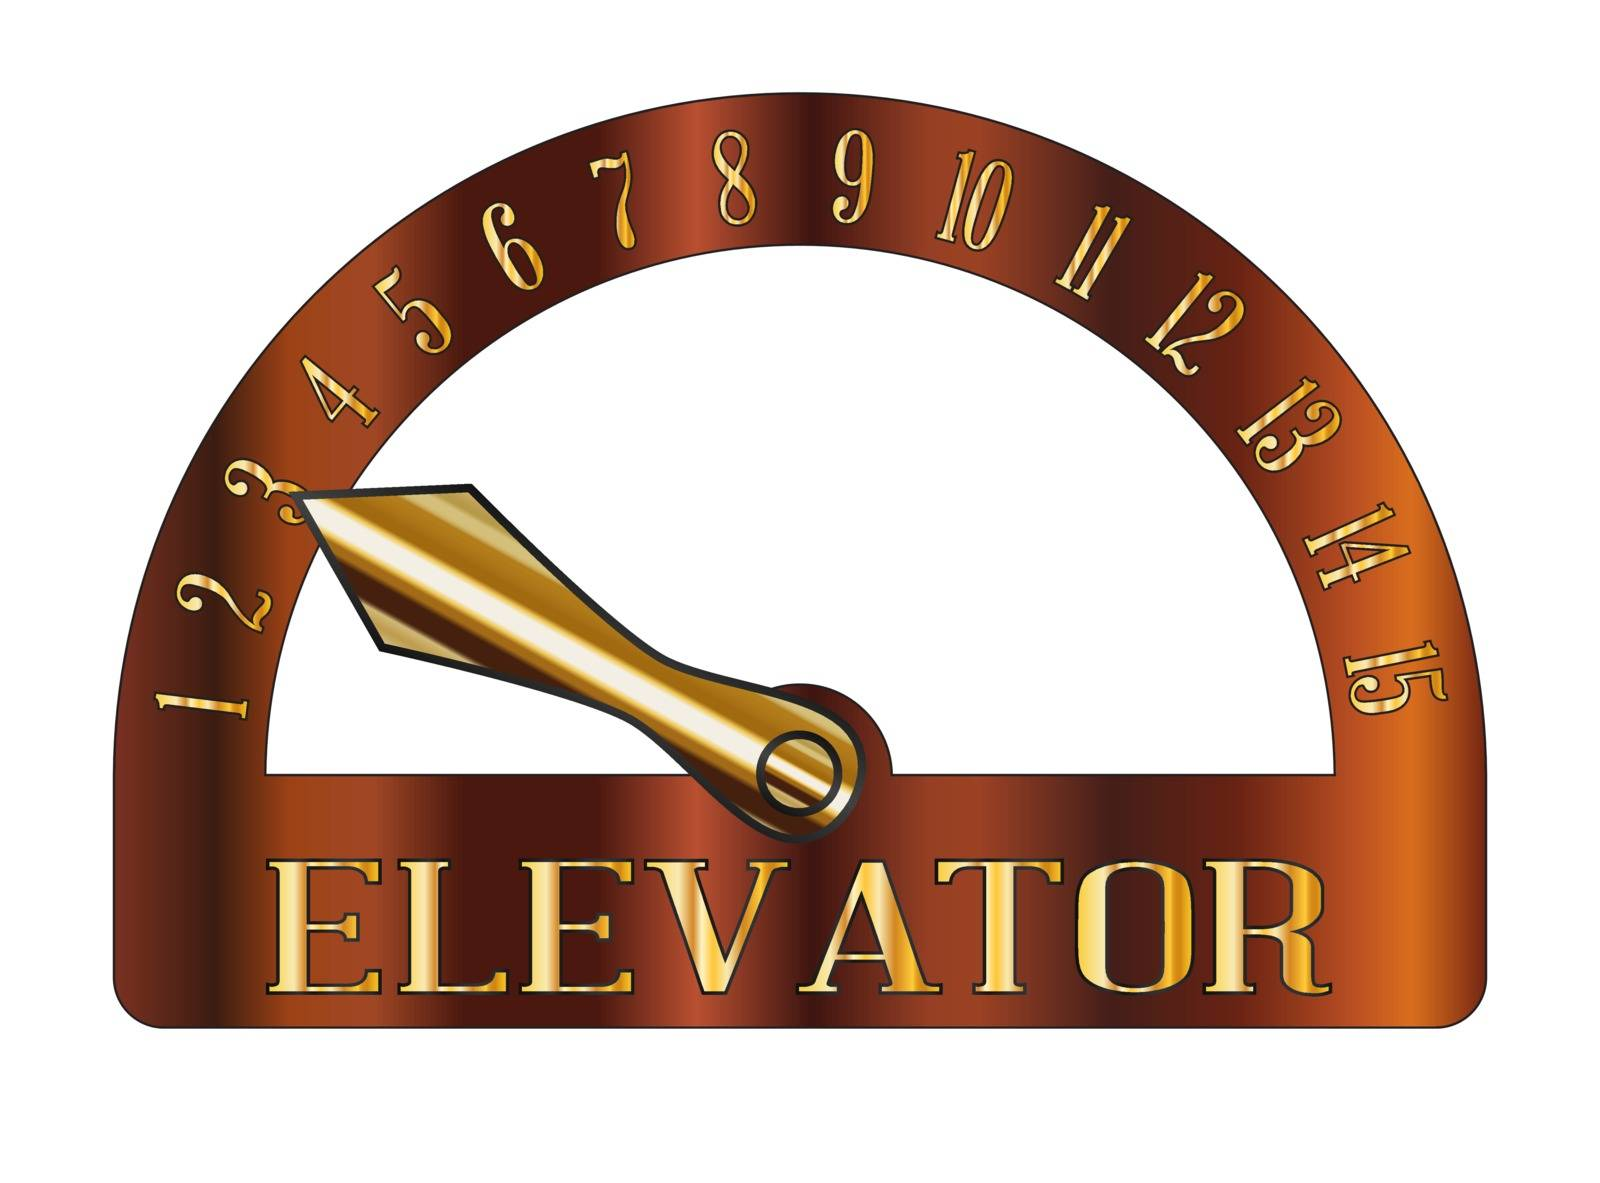 Isolated cartoon style elevator floor indicator isolated on a white background